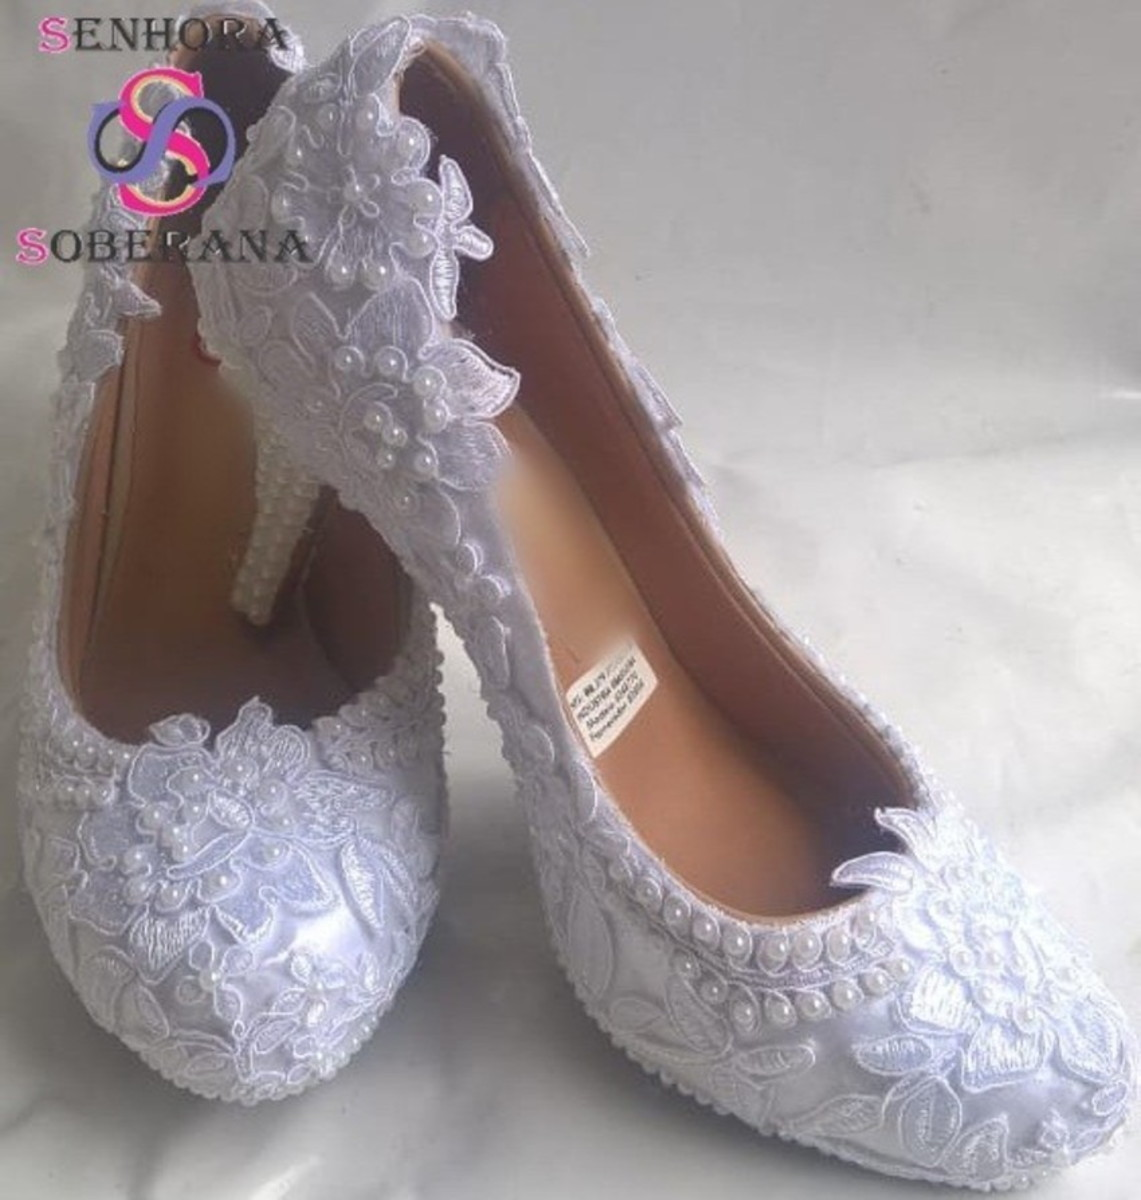 6a98ee5f79 Sapato Meia Pata Branco Rendado e perolado Cinderela (Evento no Elo7 ...